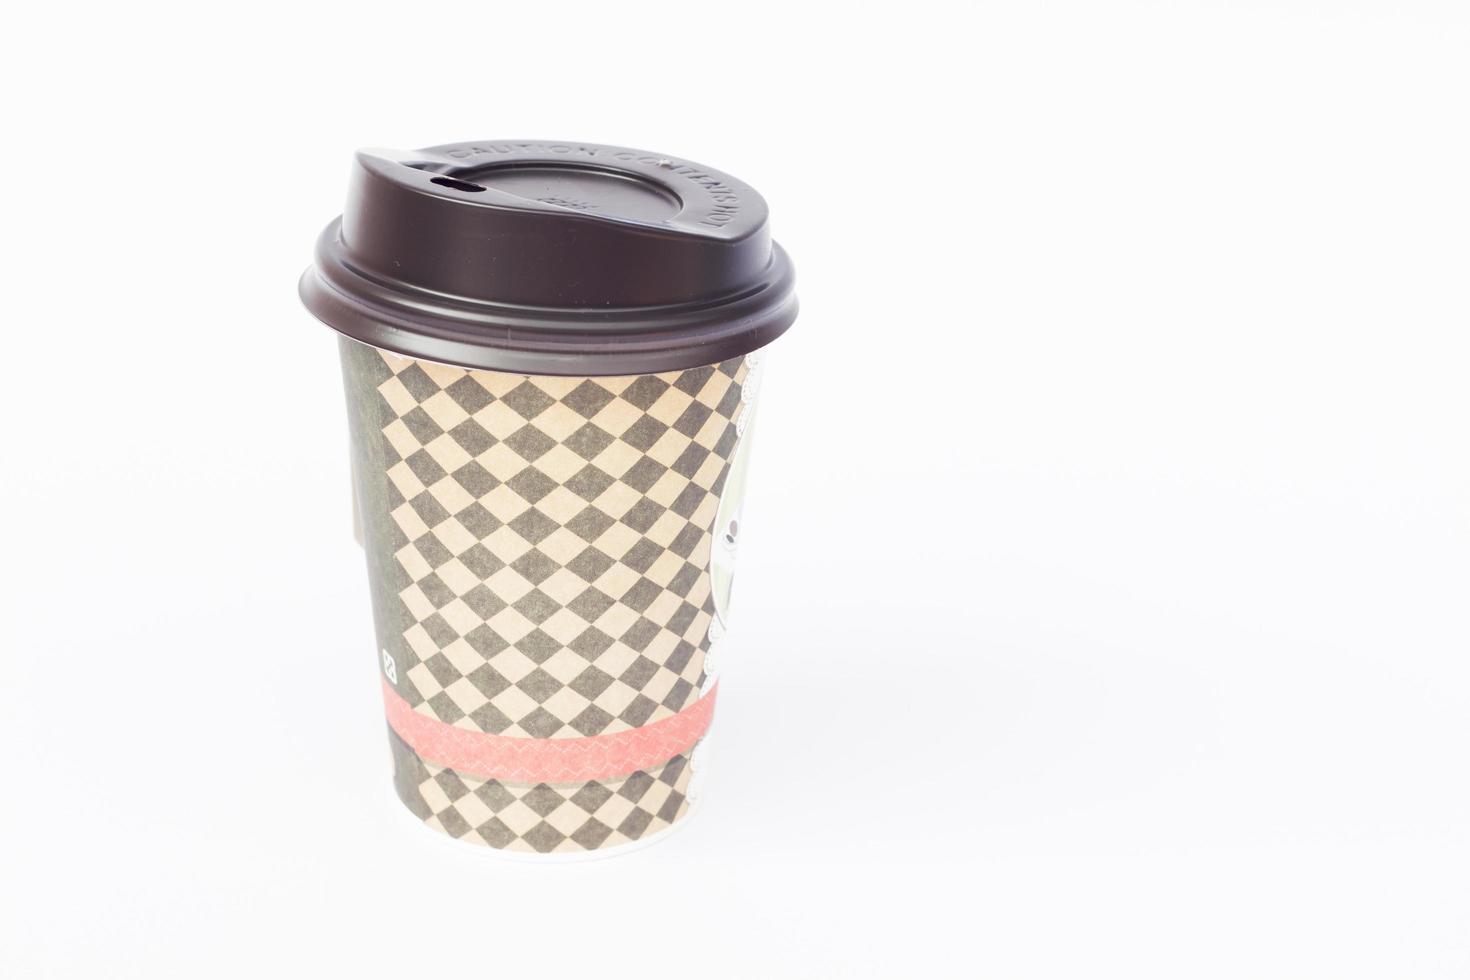 tasse à café à emporter photo